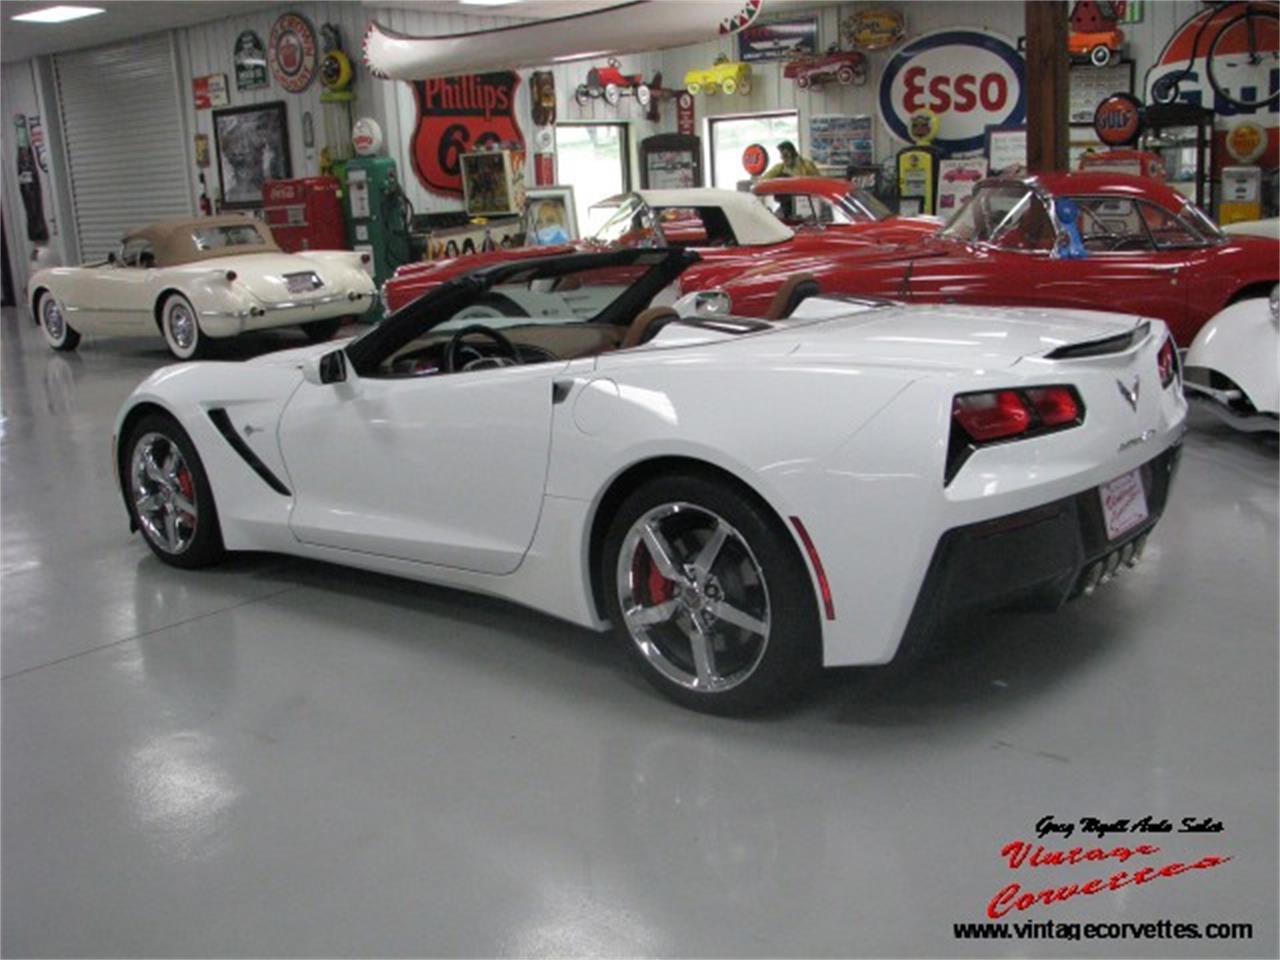 2014 Chevrolet Corvette (CC-1414728) for sale in Summerville, Georgia